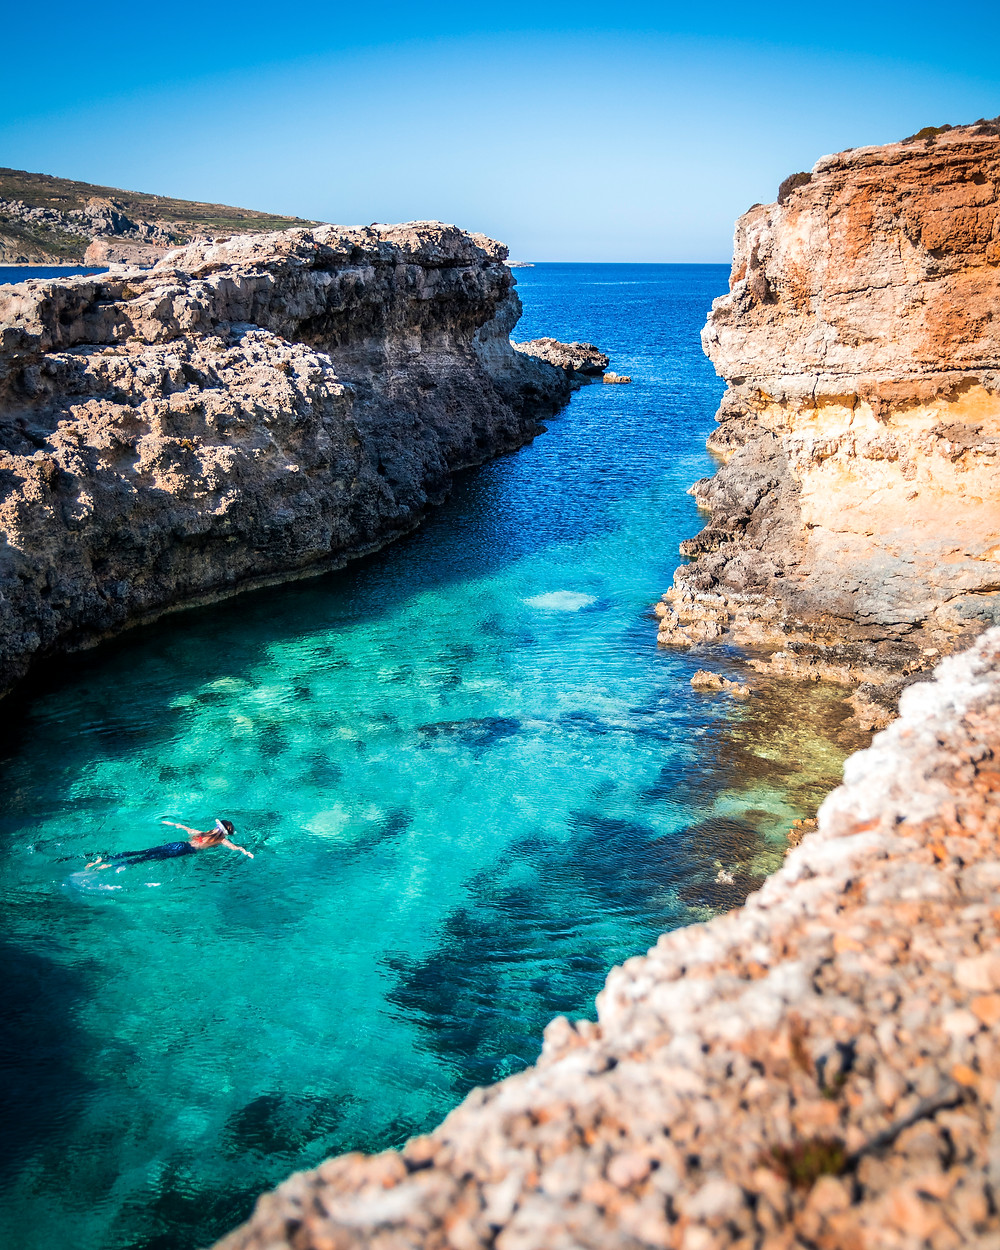 Comino Island, Blue Lagoon Boat Trip, Malta, Mediterranean Sea